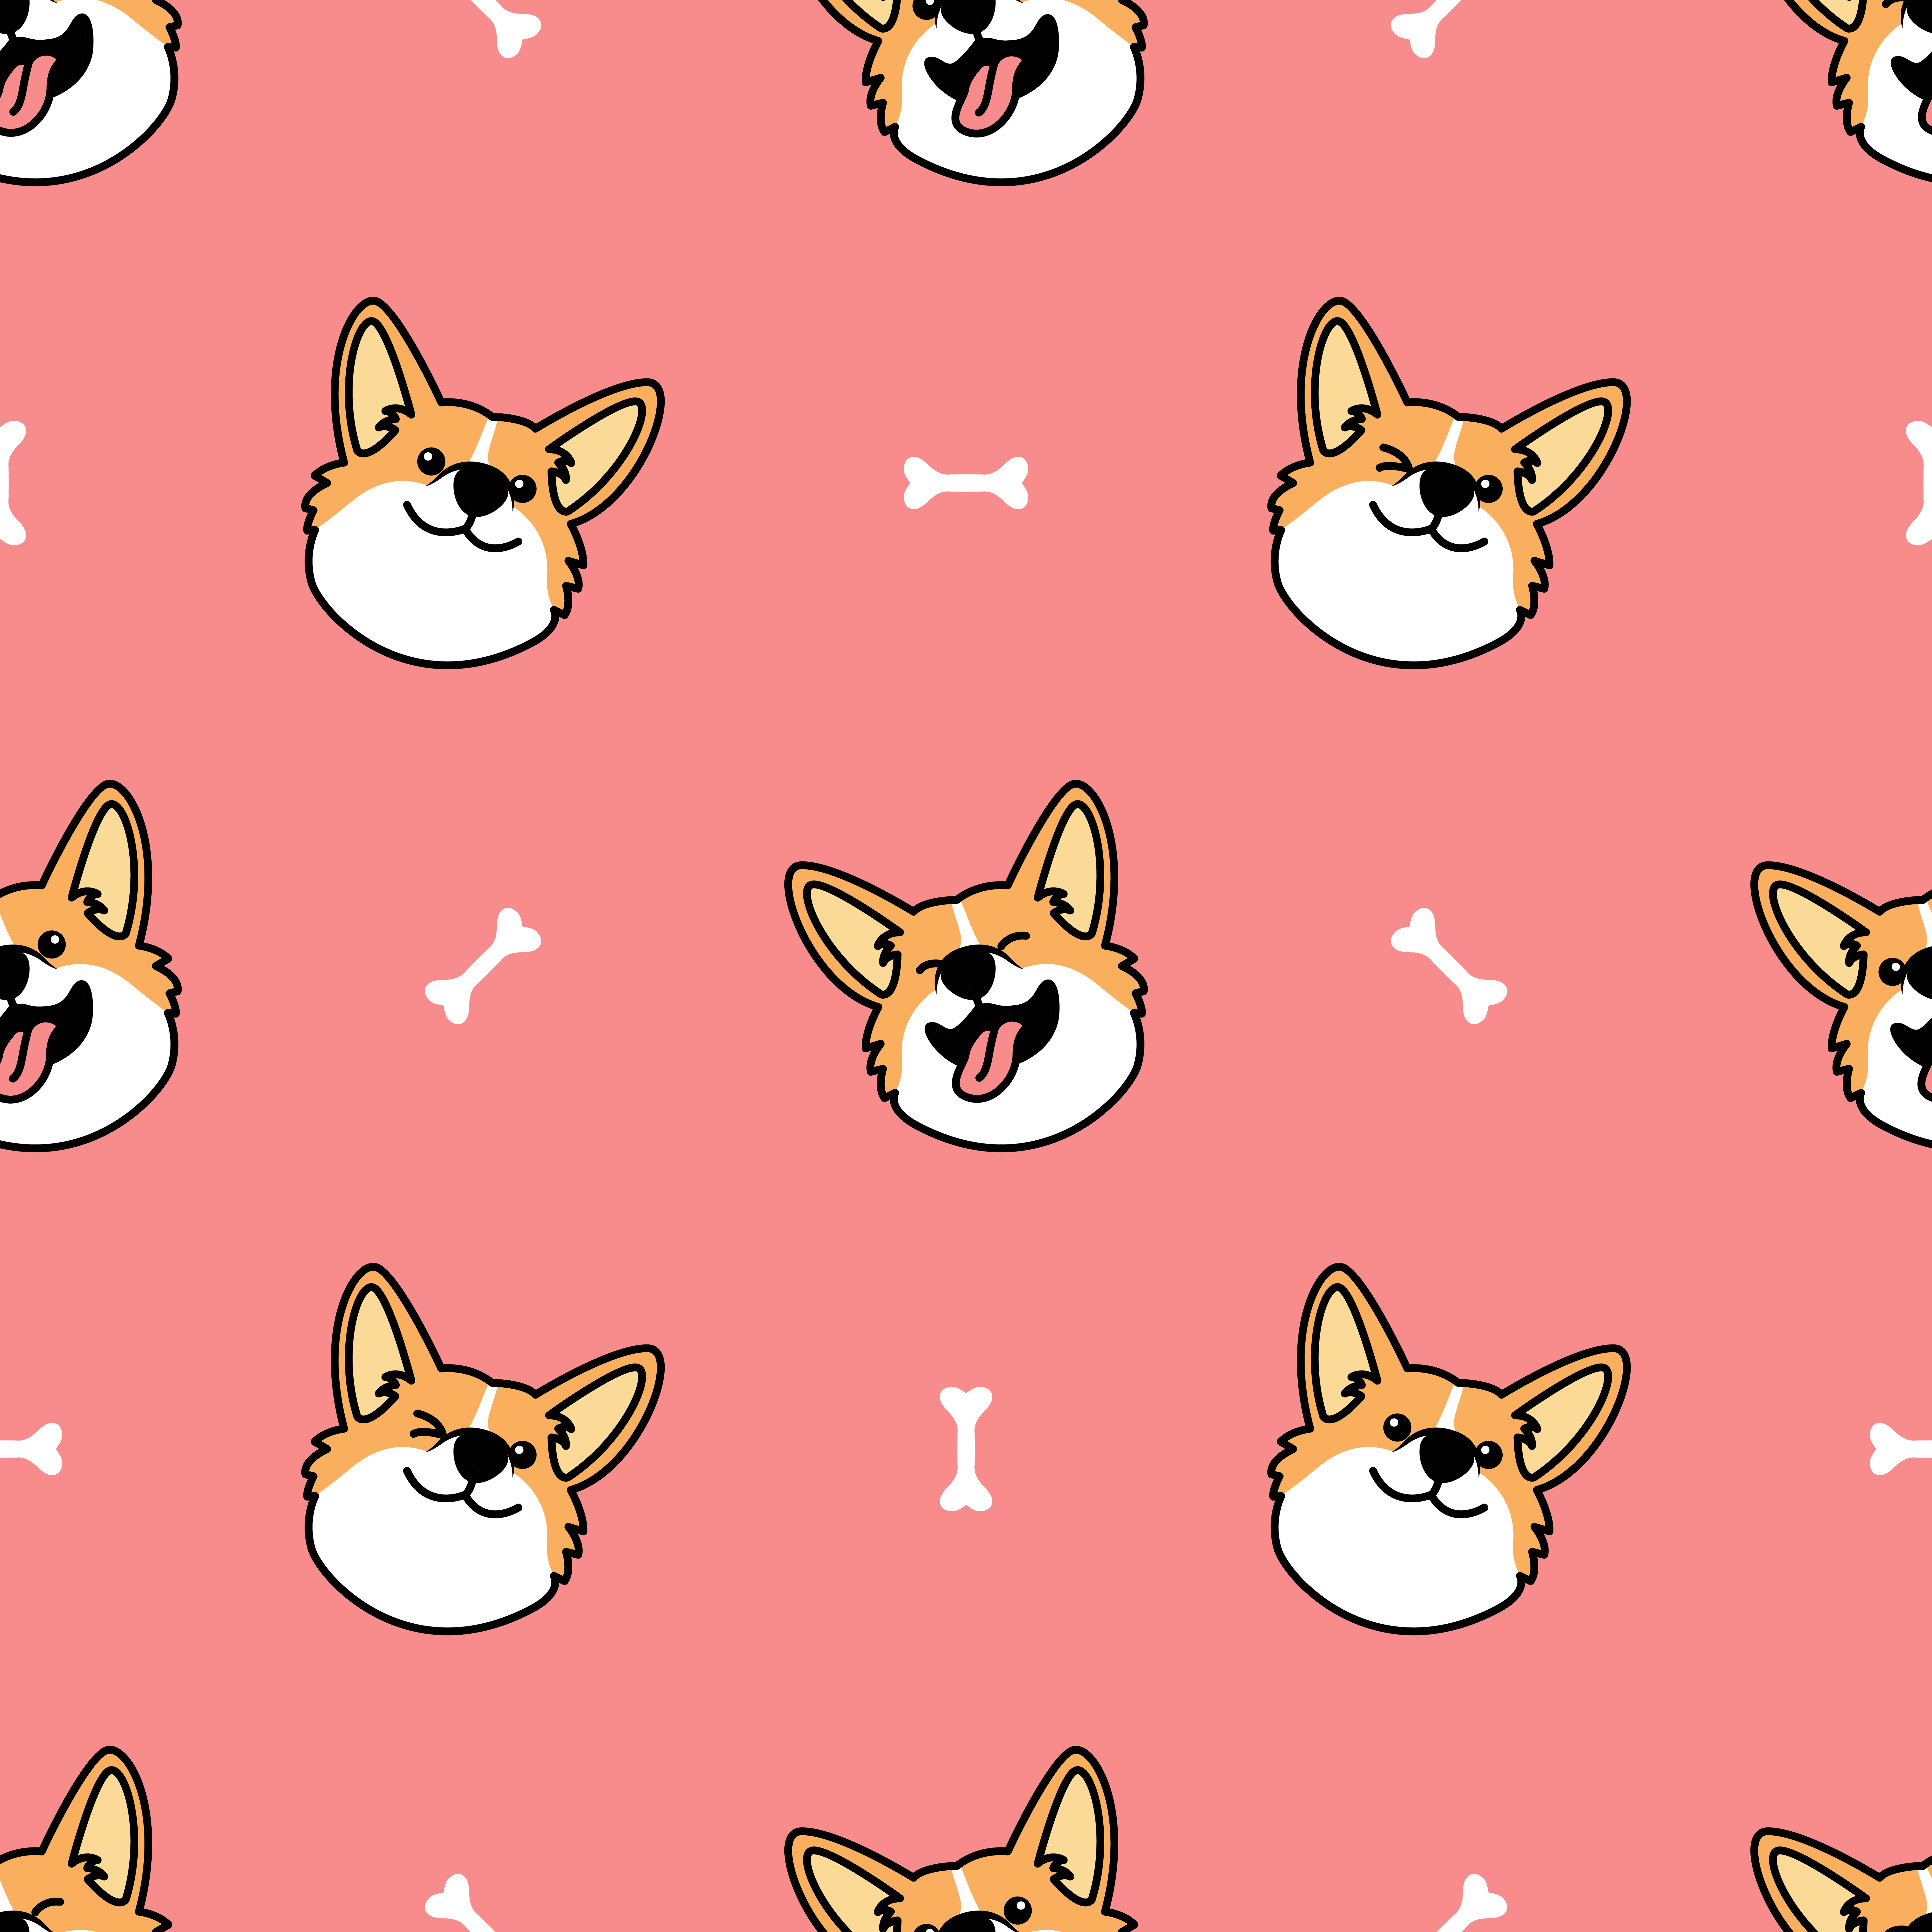 Cute Welsh Corgi Dog Face Cartoon Seamless Pattern